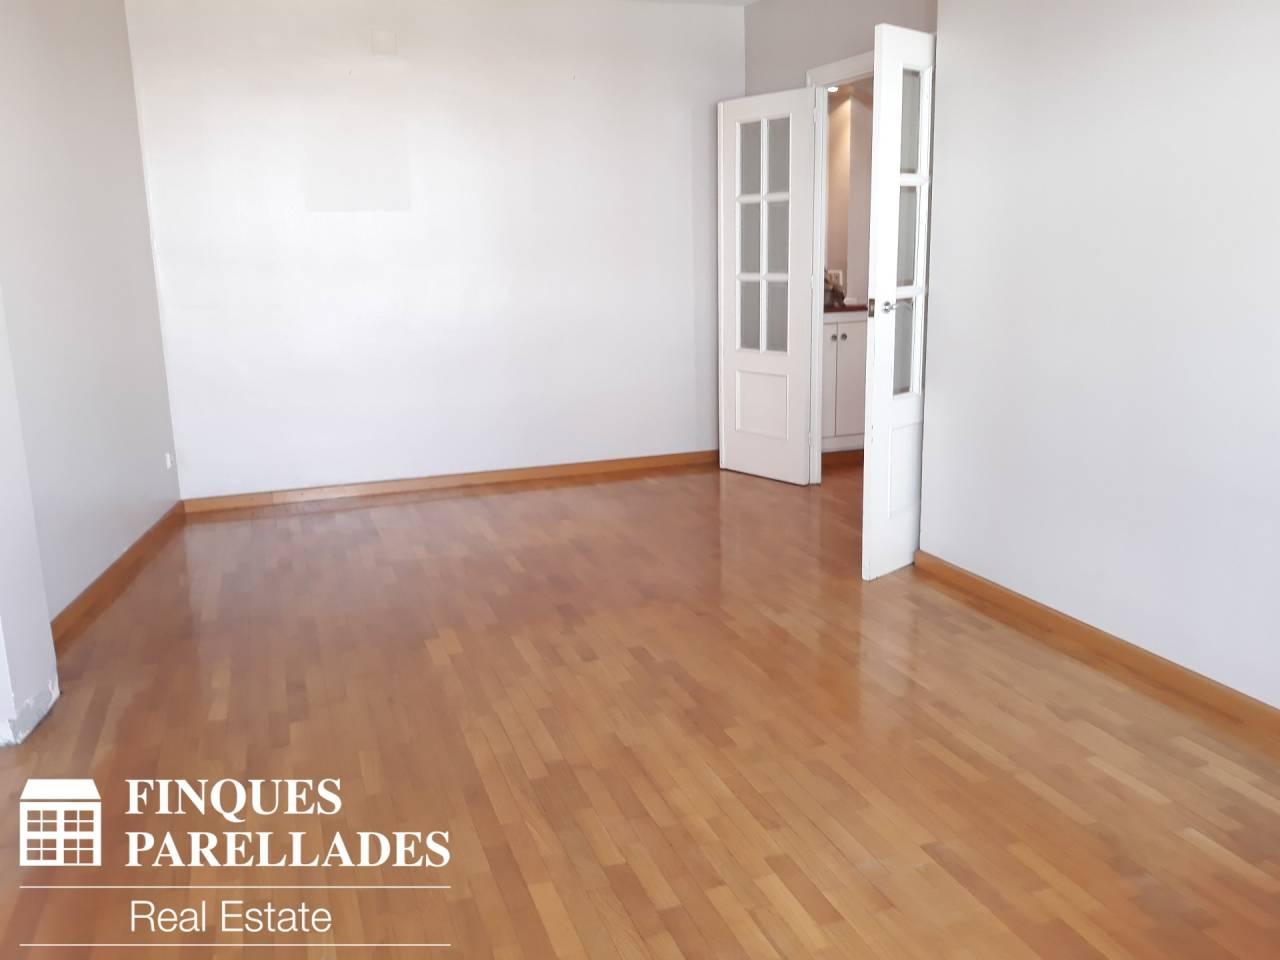 Flat for rent in Sant Sebastià-Aiguadolç